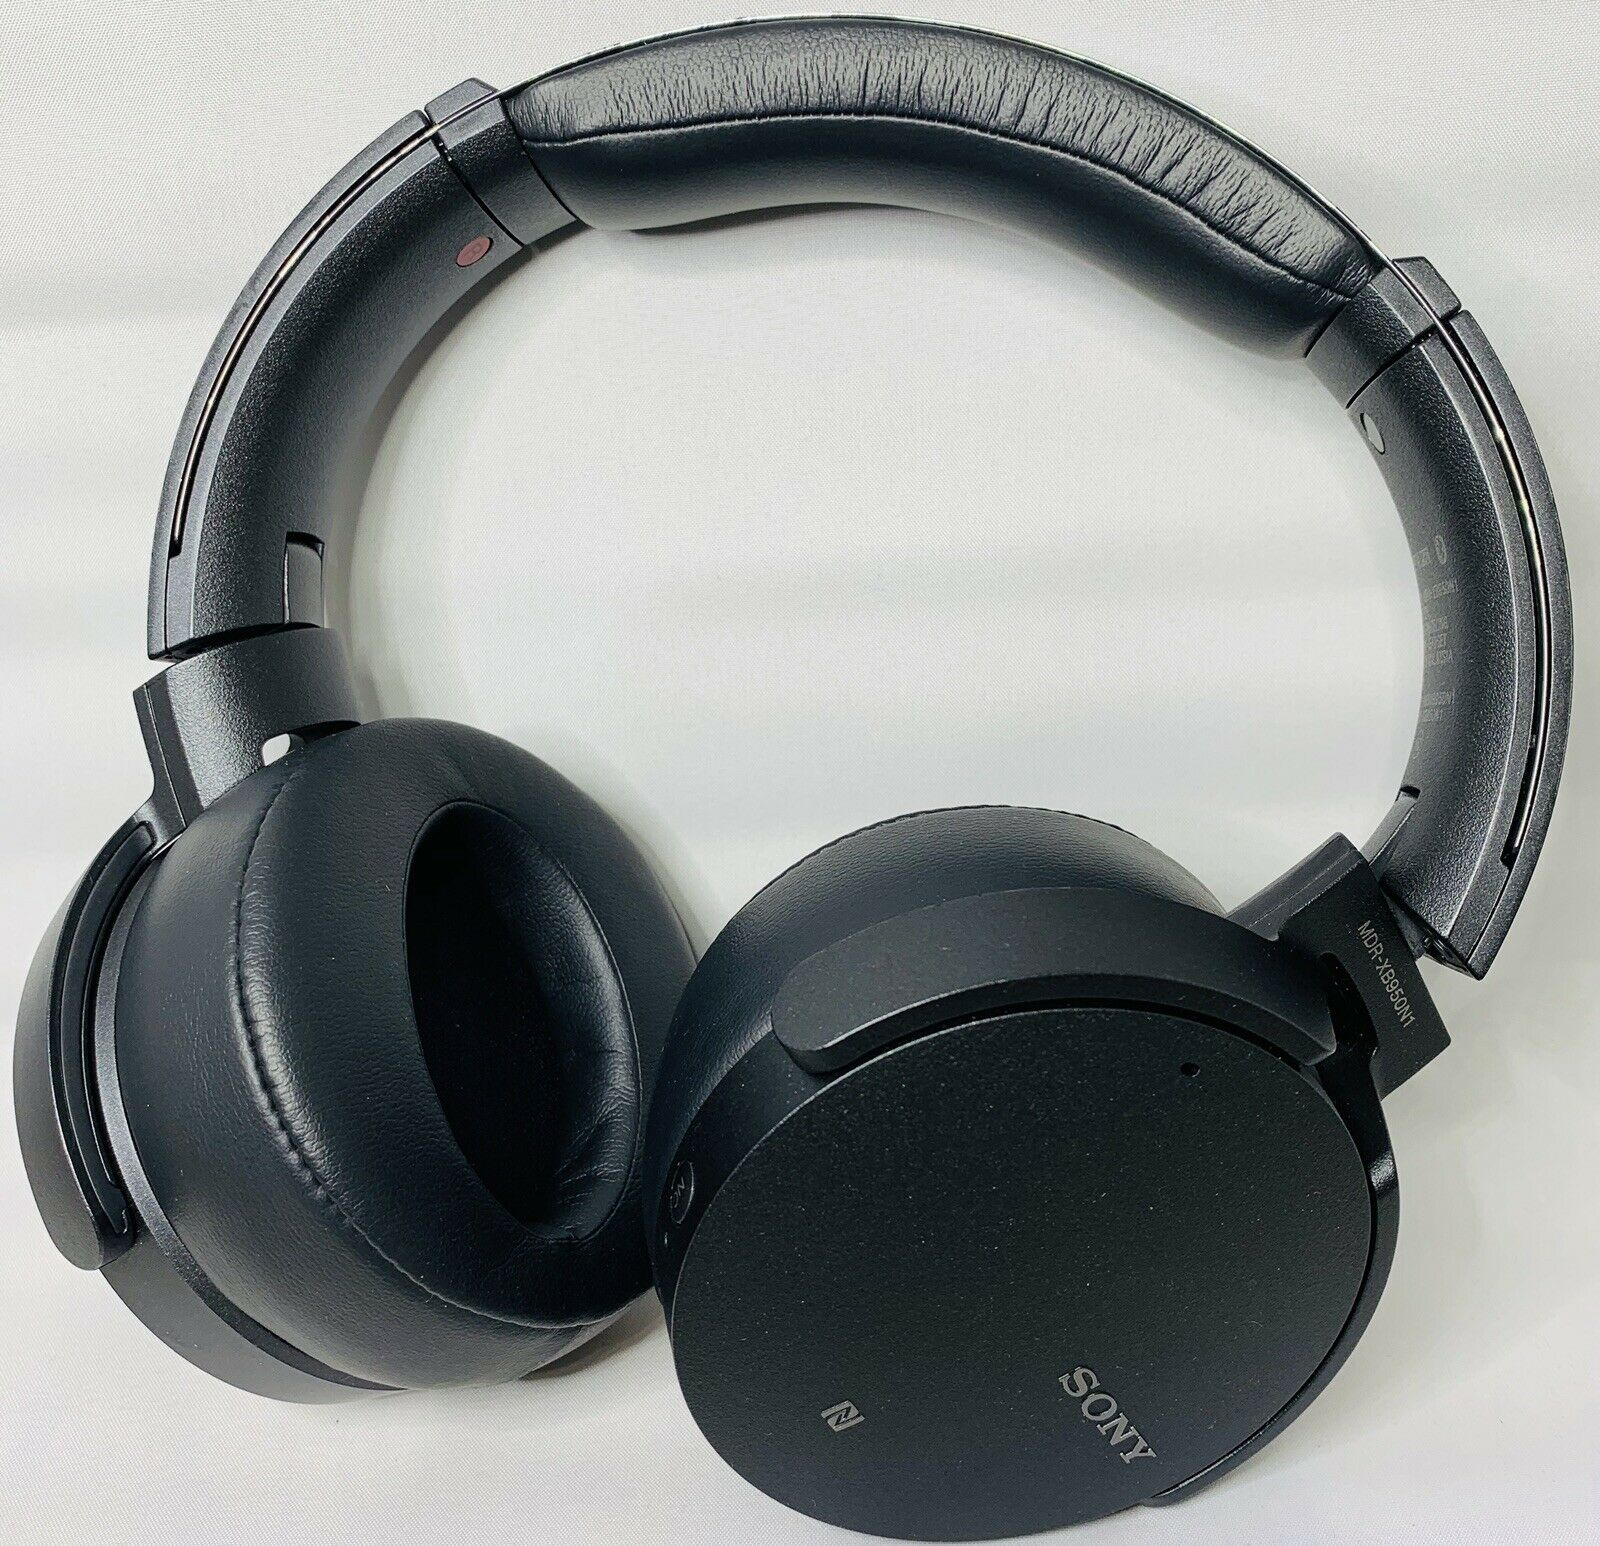 Sony Extra Bass Over-Ear Headphones - Black (MDR-XB950N1)